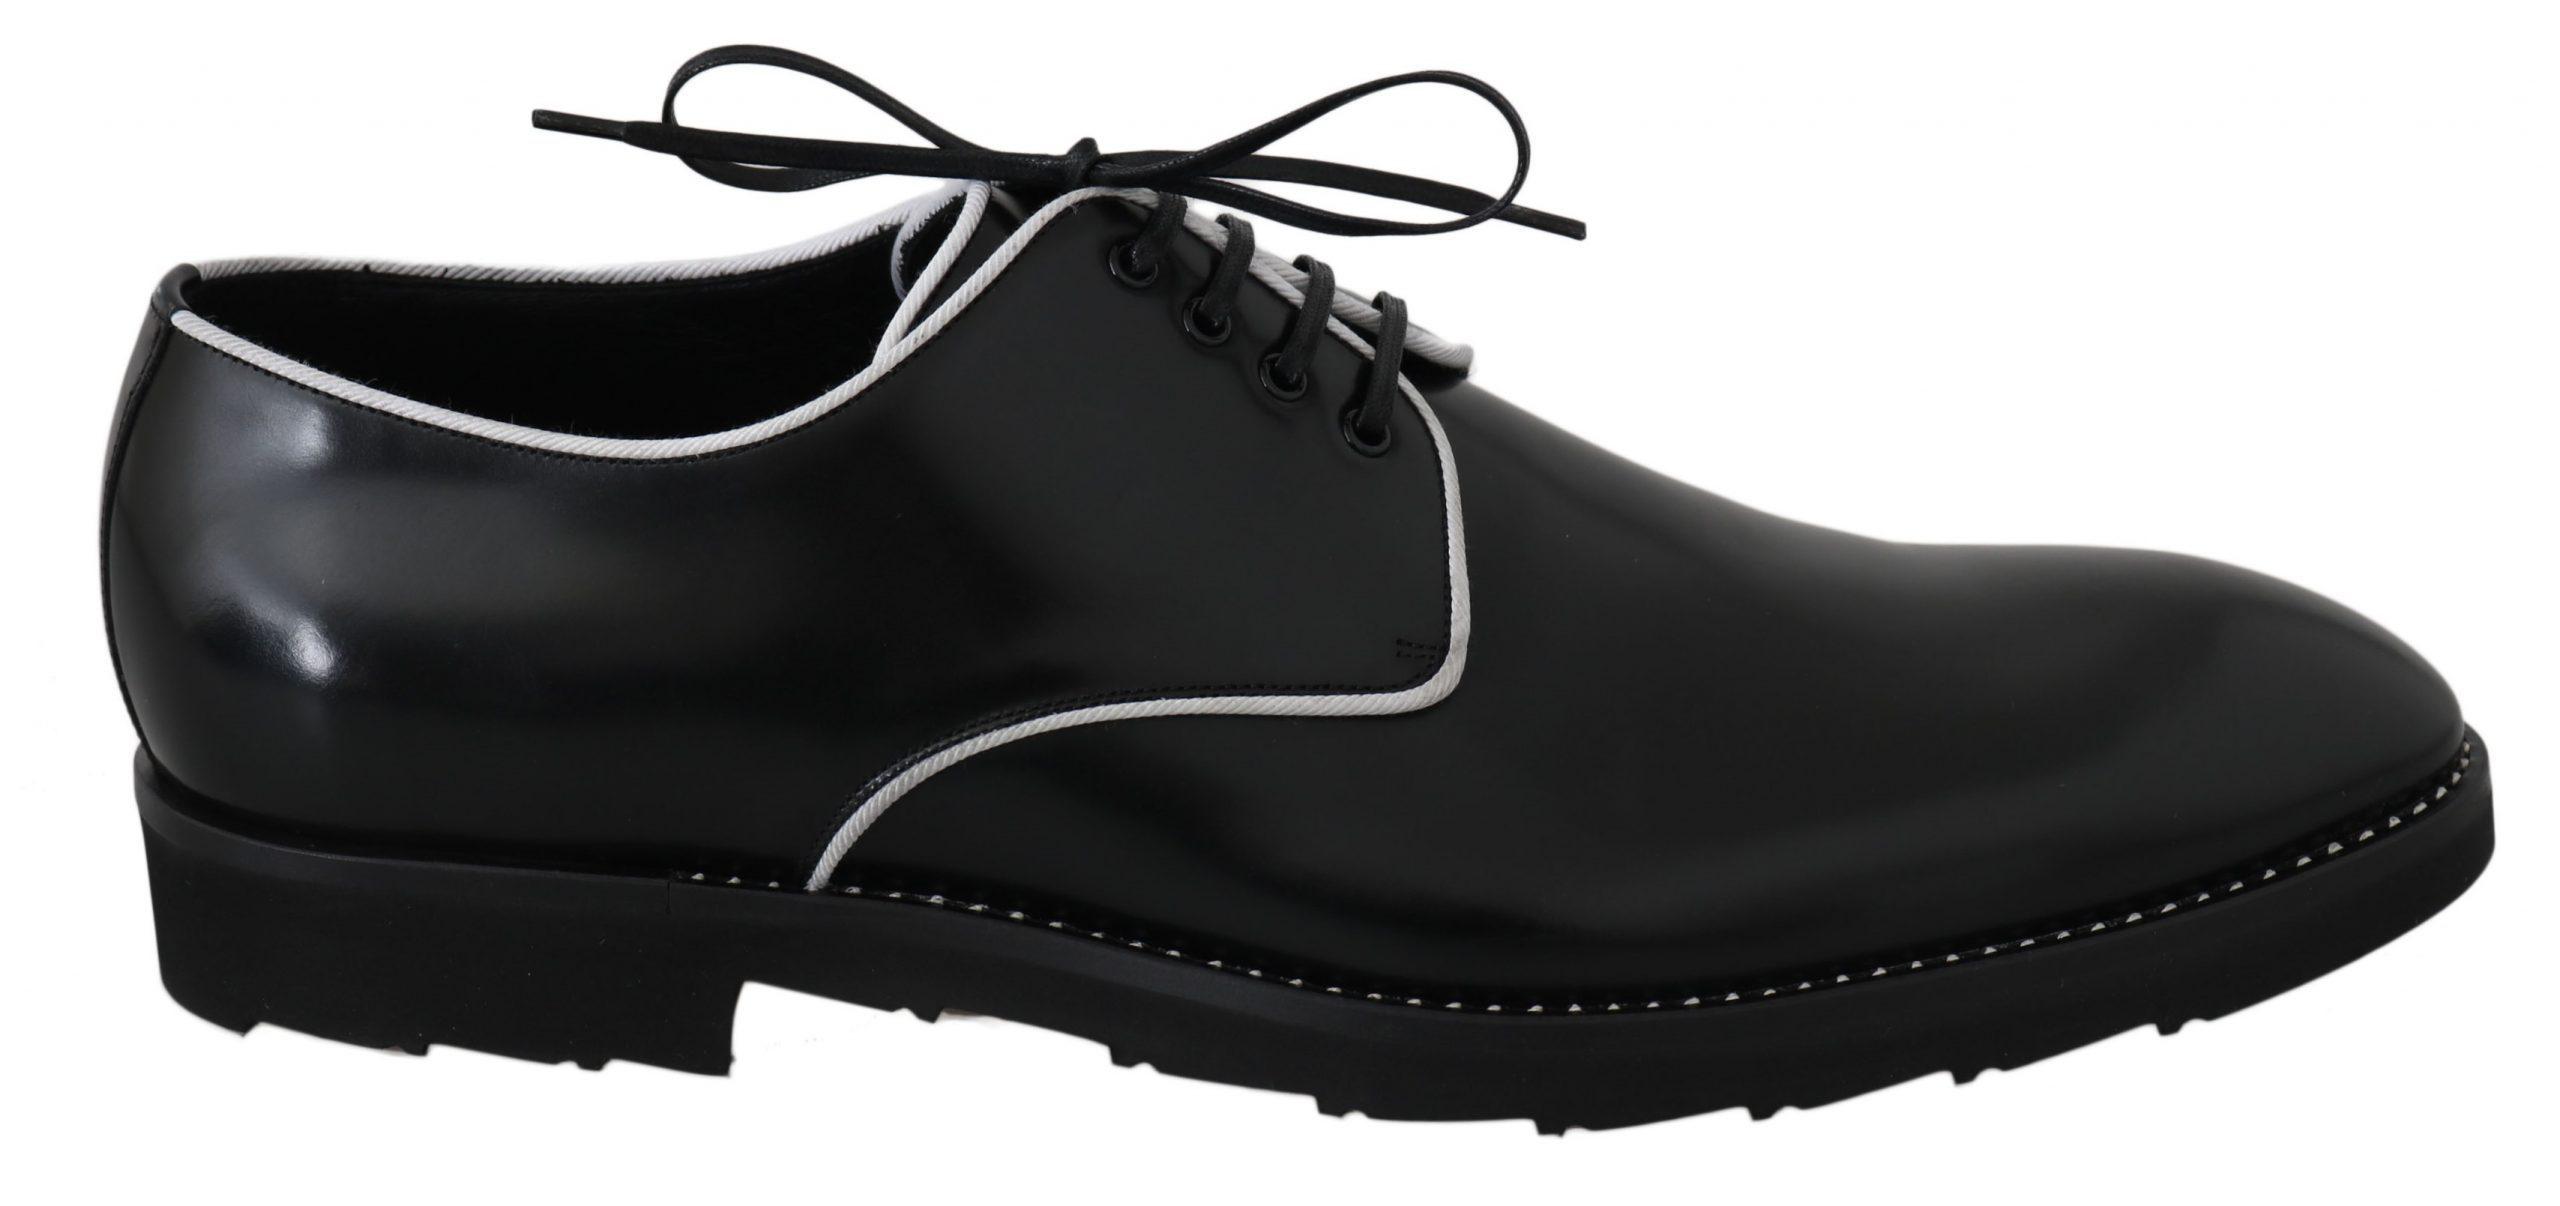 Dolce & Gabbana Men's Shoes Black, White MV2320 - EU39/US6